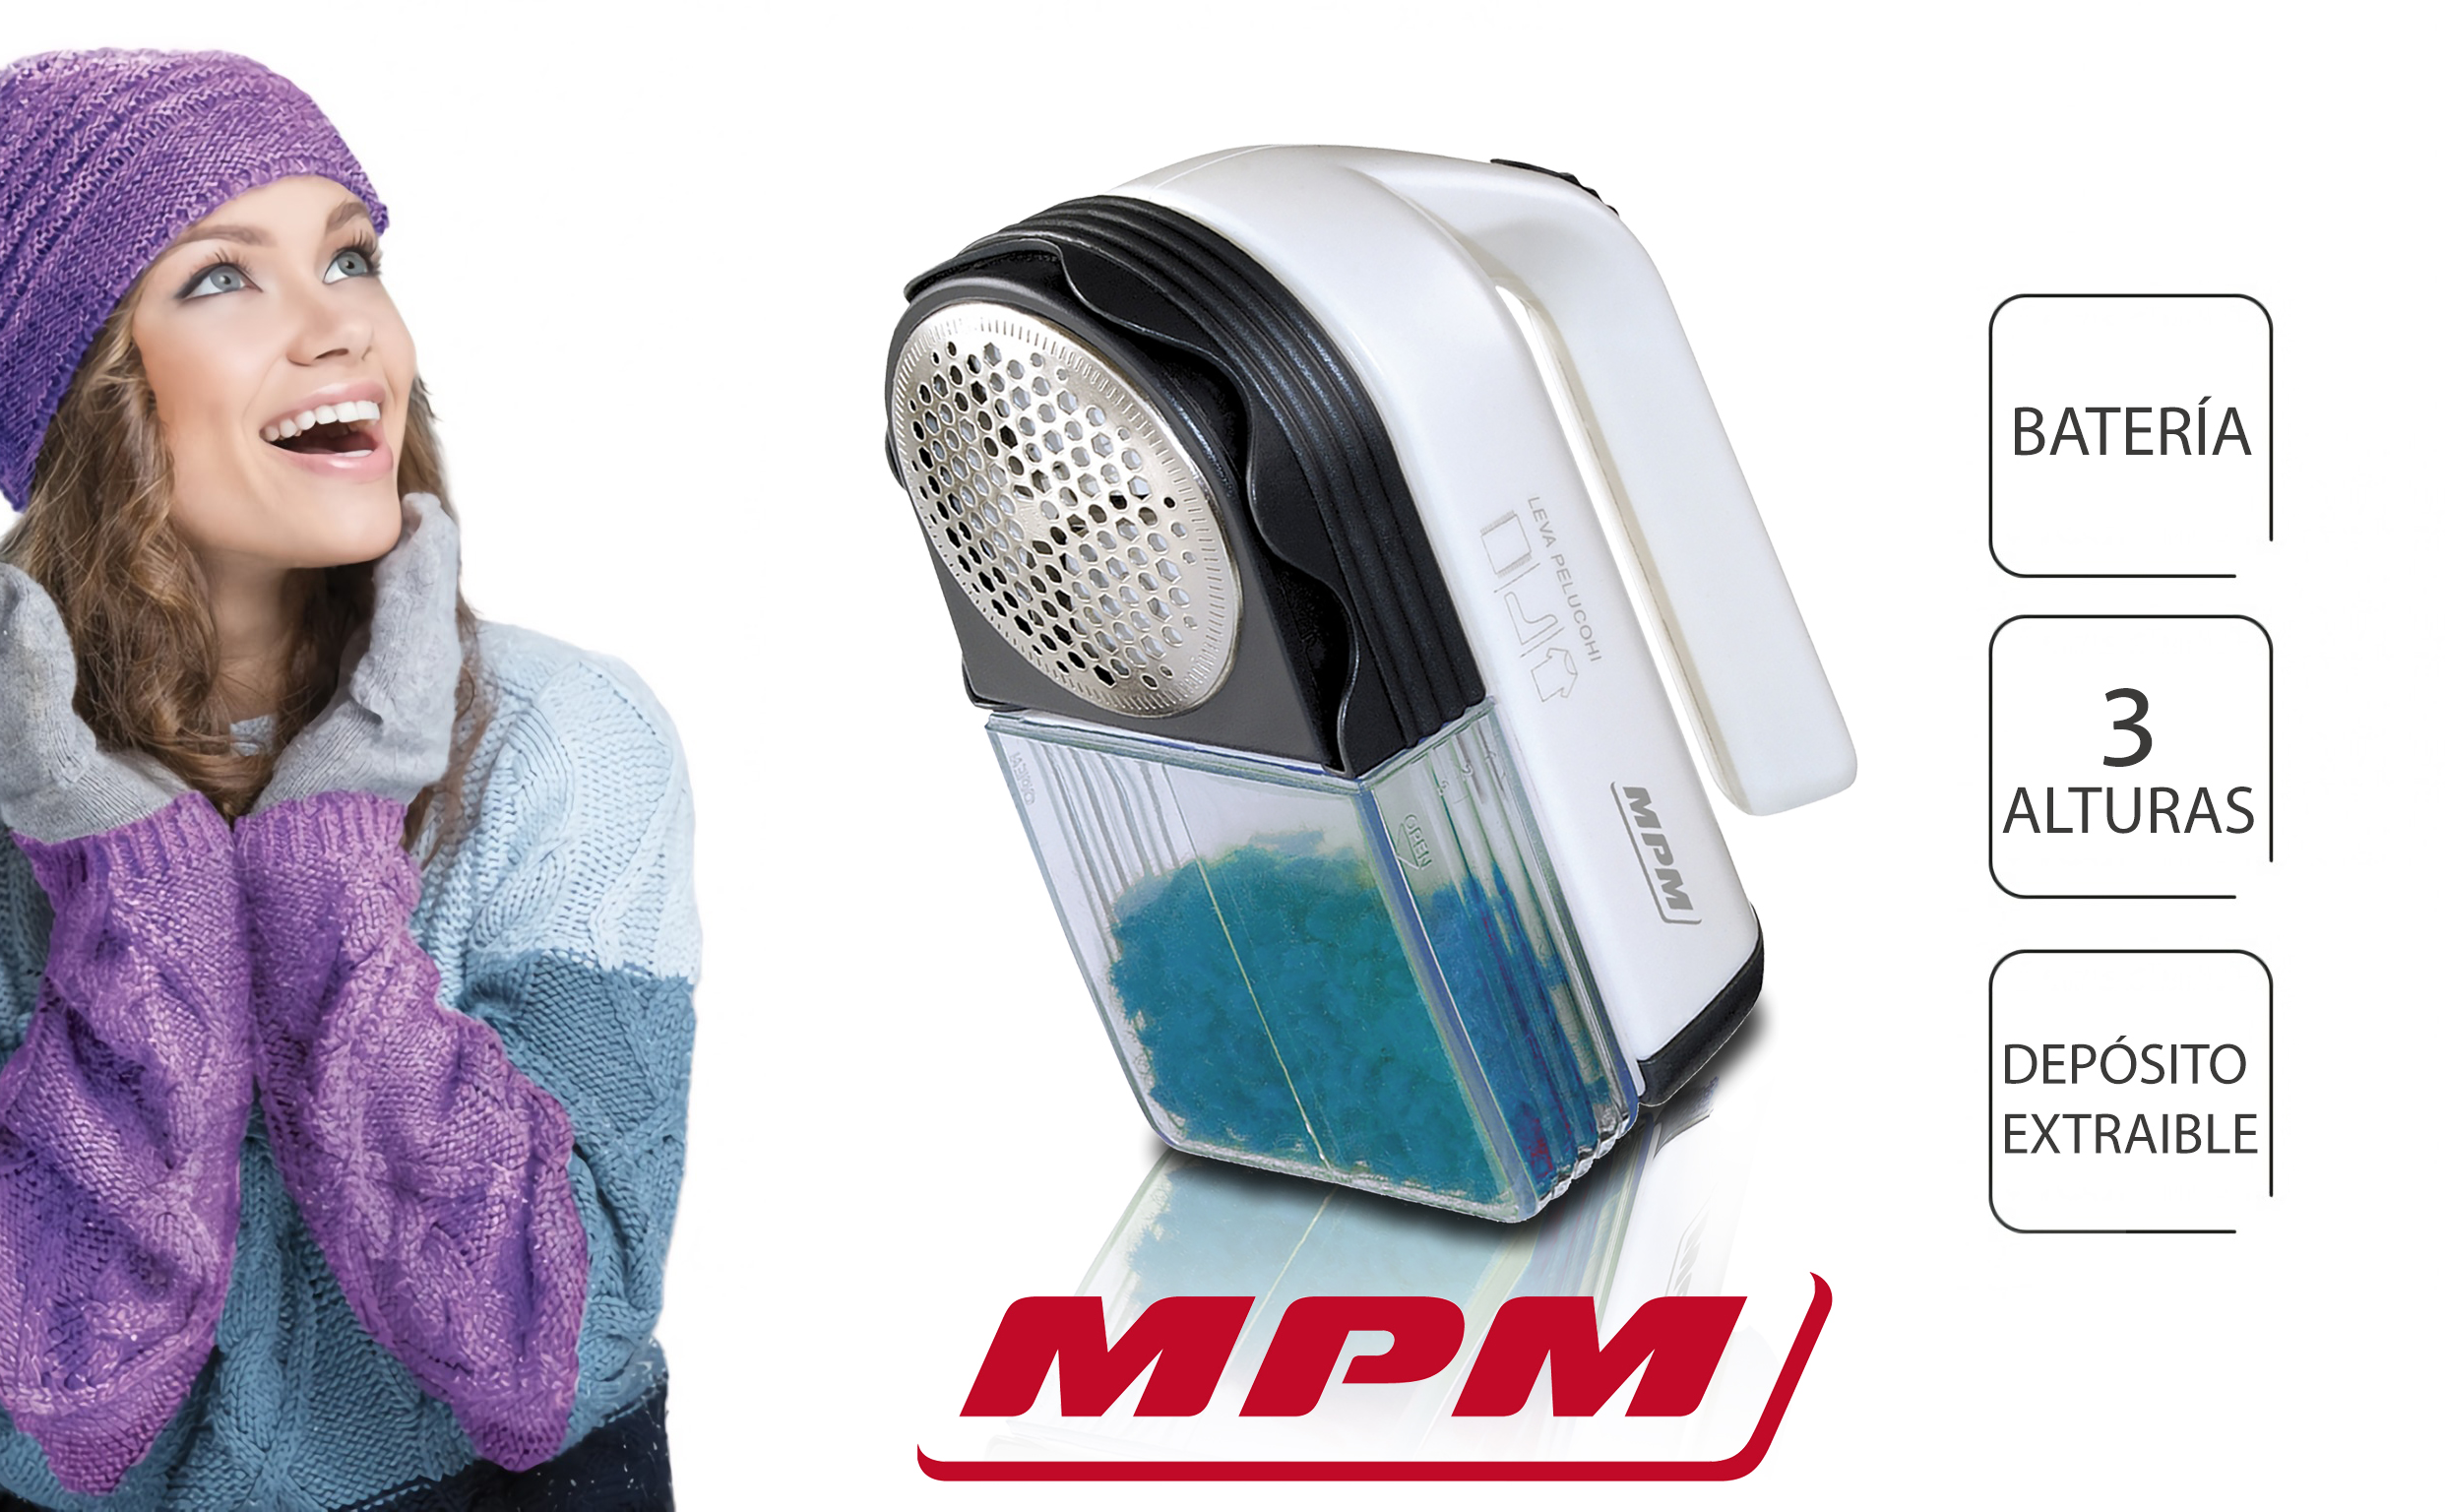 MPM LR-027-84 Quitapelusas Eléctrico para Ropa, 3 Alturas, Lana, Abrigos, Jerseys, Depósito extraible, Pilas, 3W